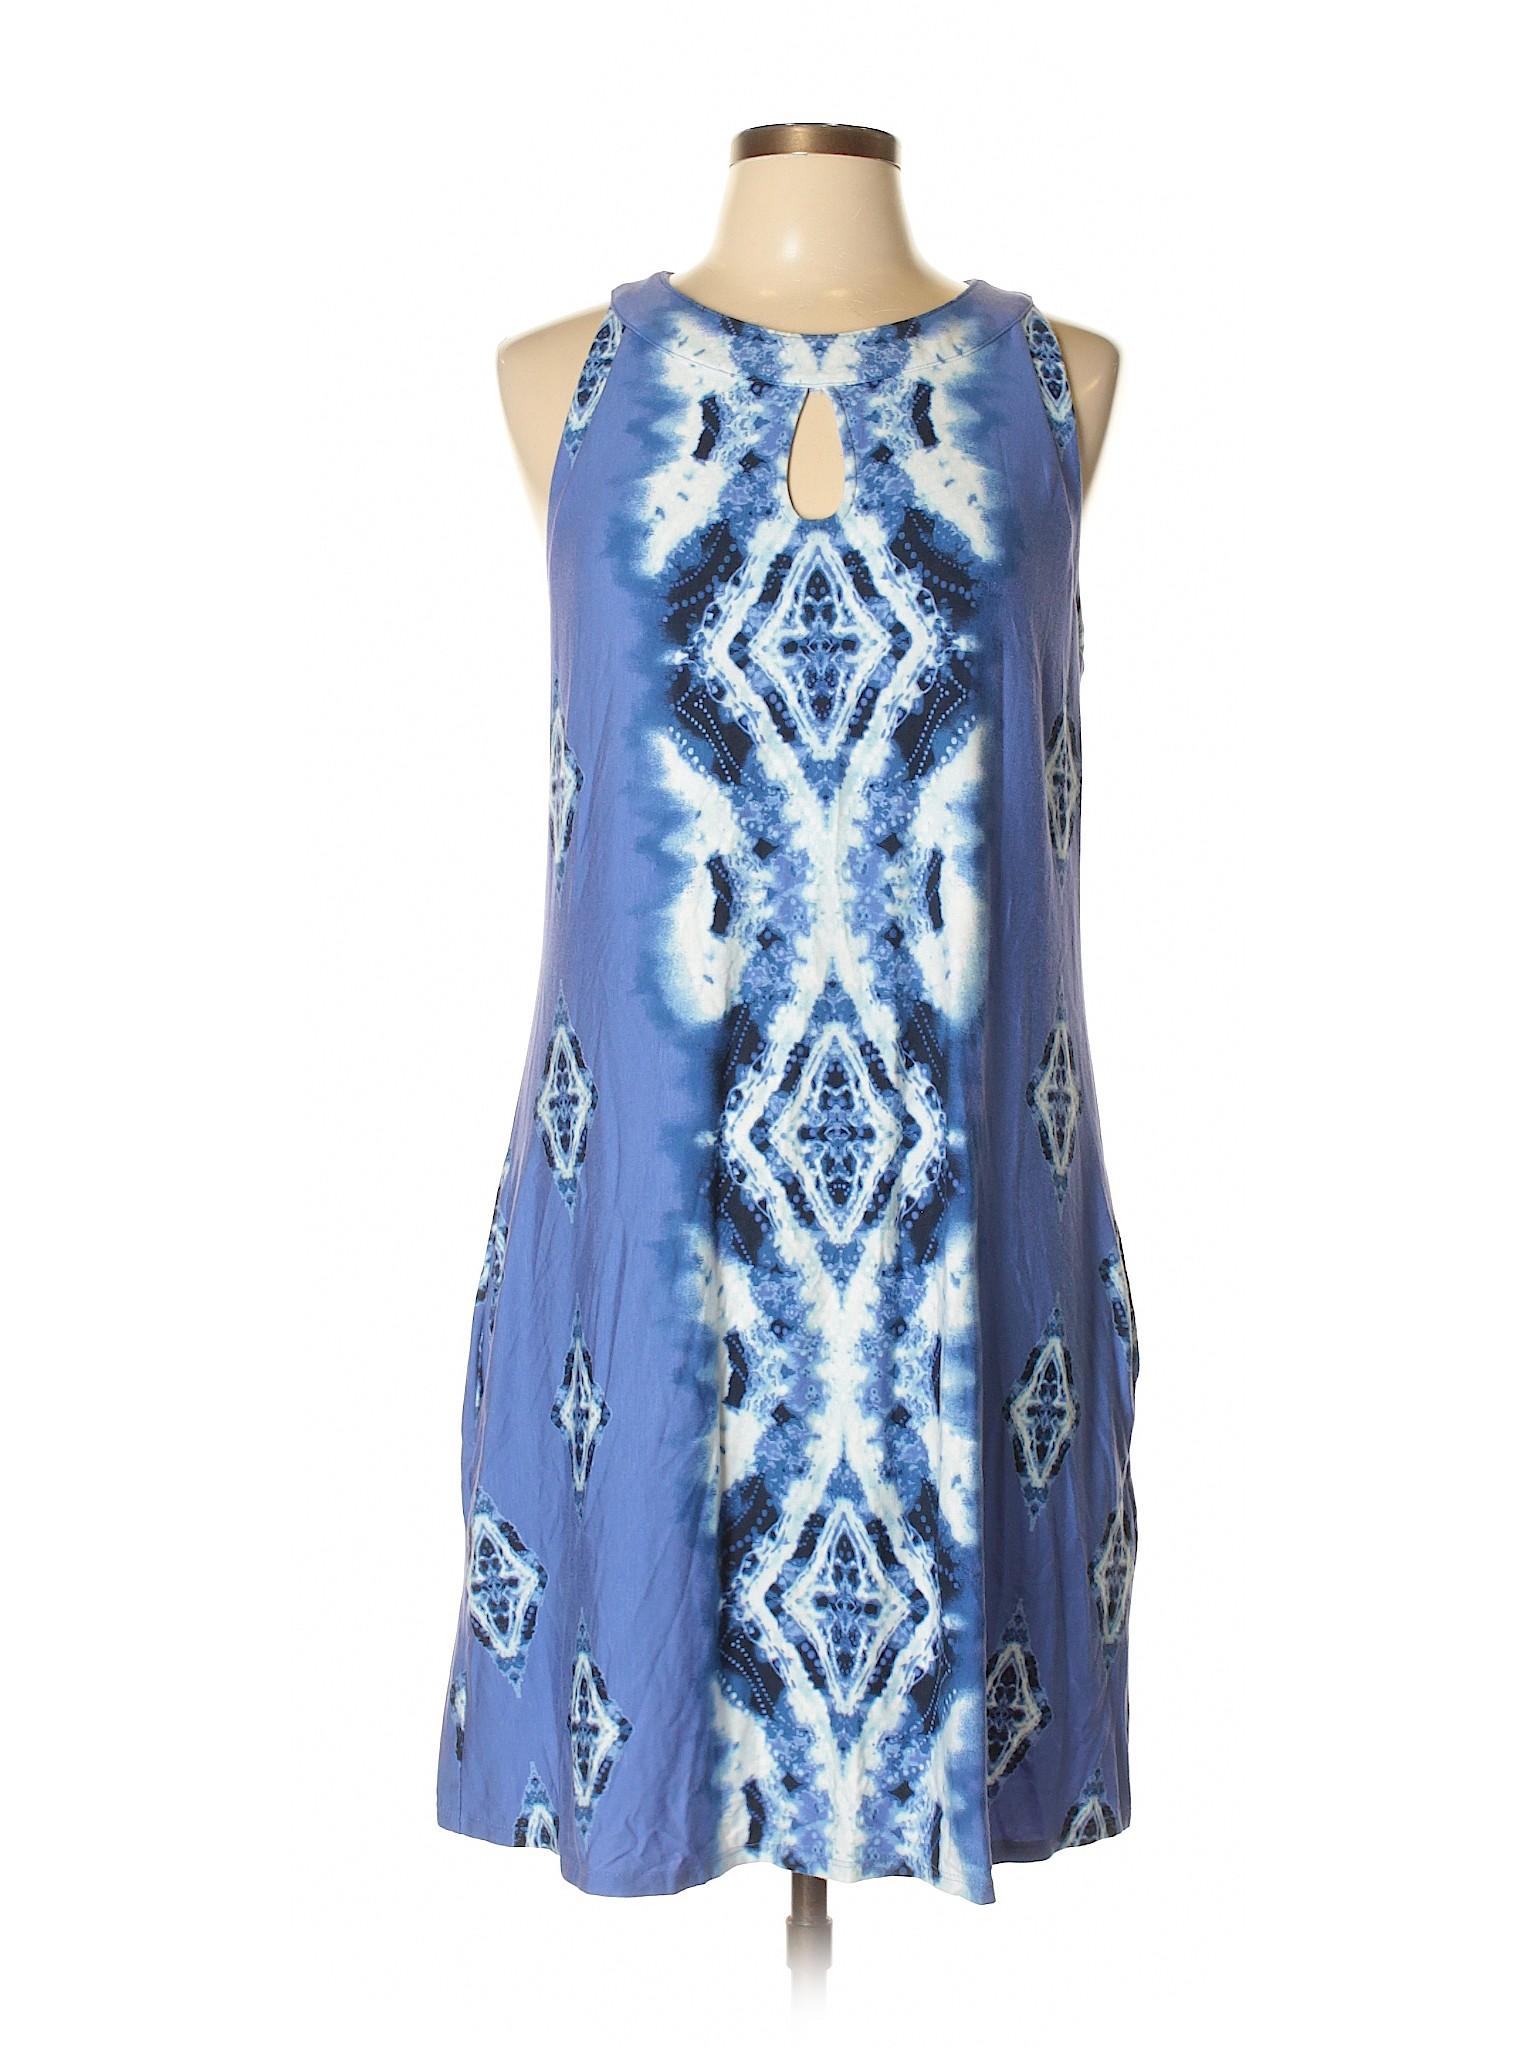 Dress Casual Selling Soma Soma Dress Casual Casual Selling Soma Selling O7wfWHfqI